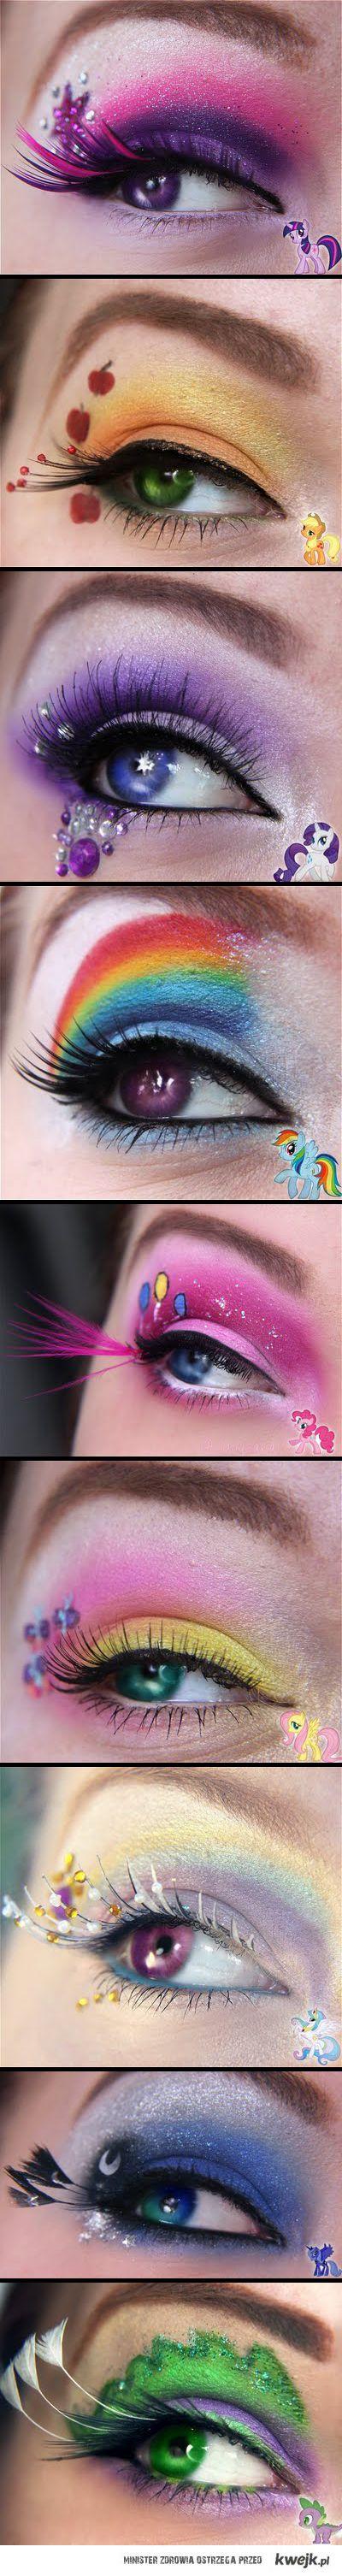 best eyes of beauty images on pinterest artistic make up